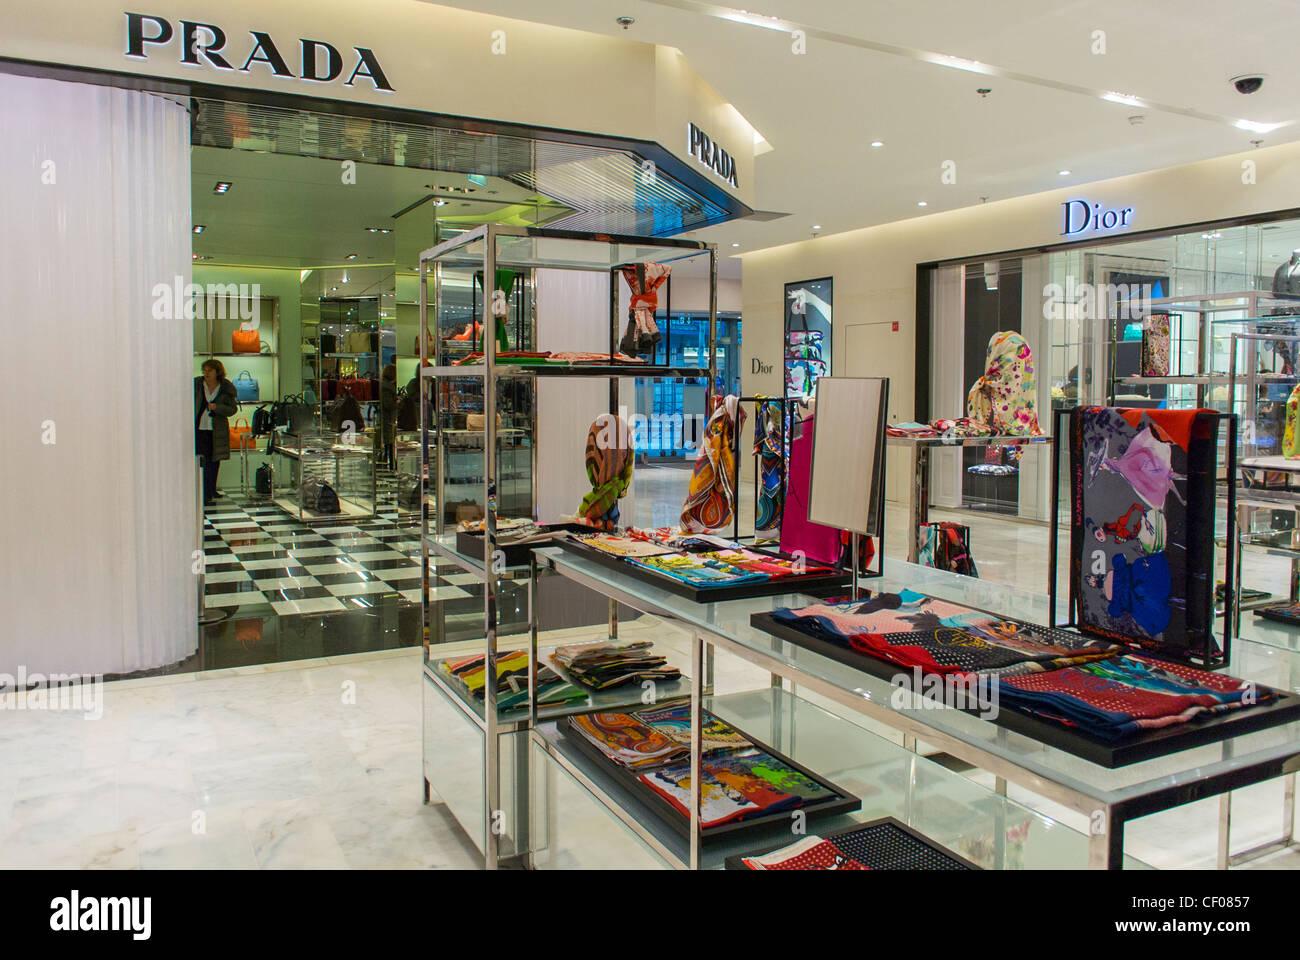 luxury brands store dior stock photos amp luxury brands